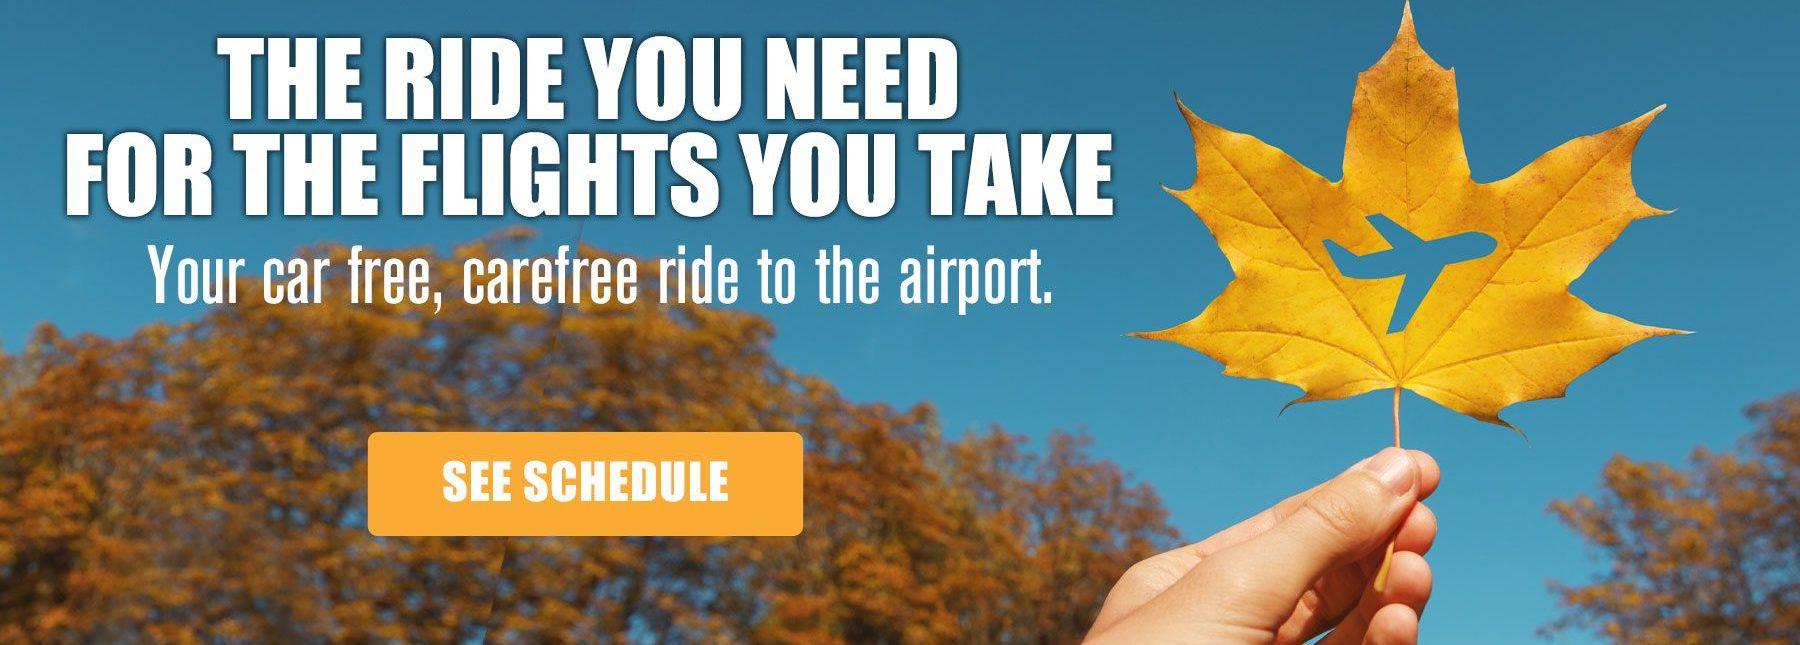 Ride You Need 210922 V3 1800x745